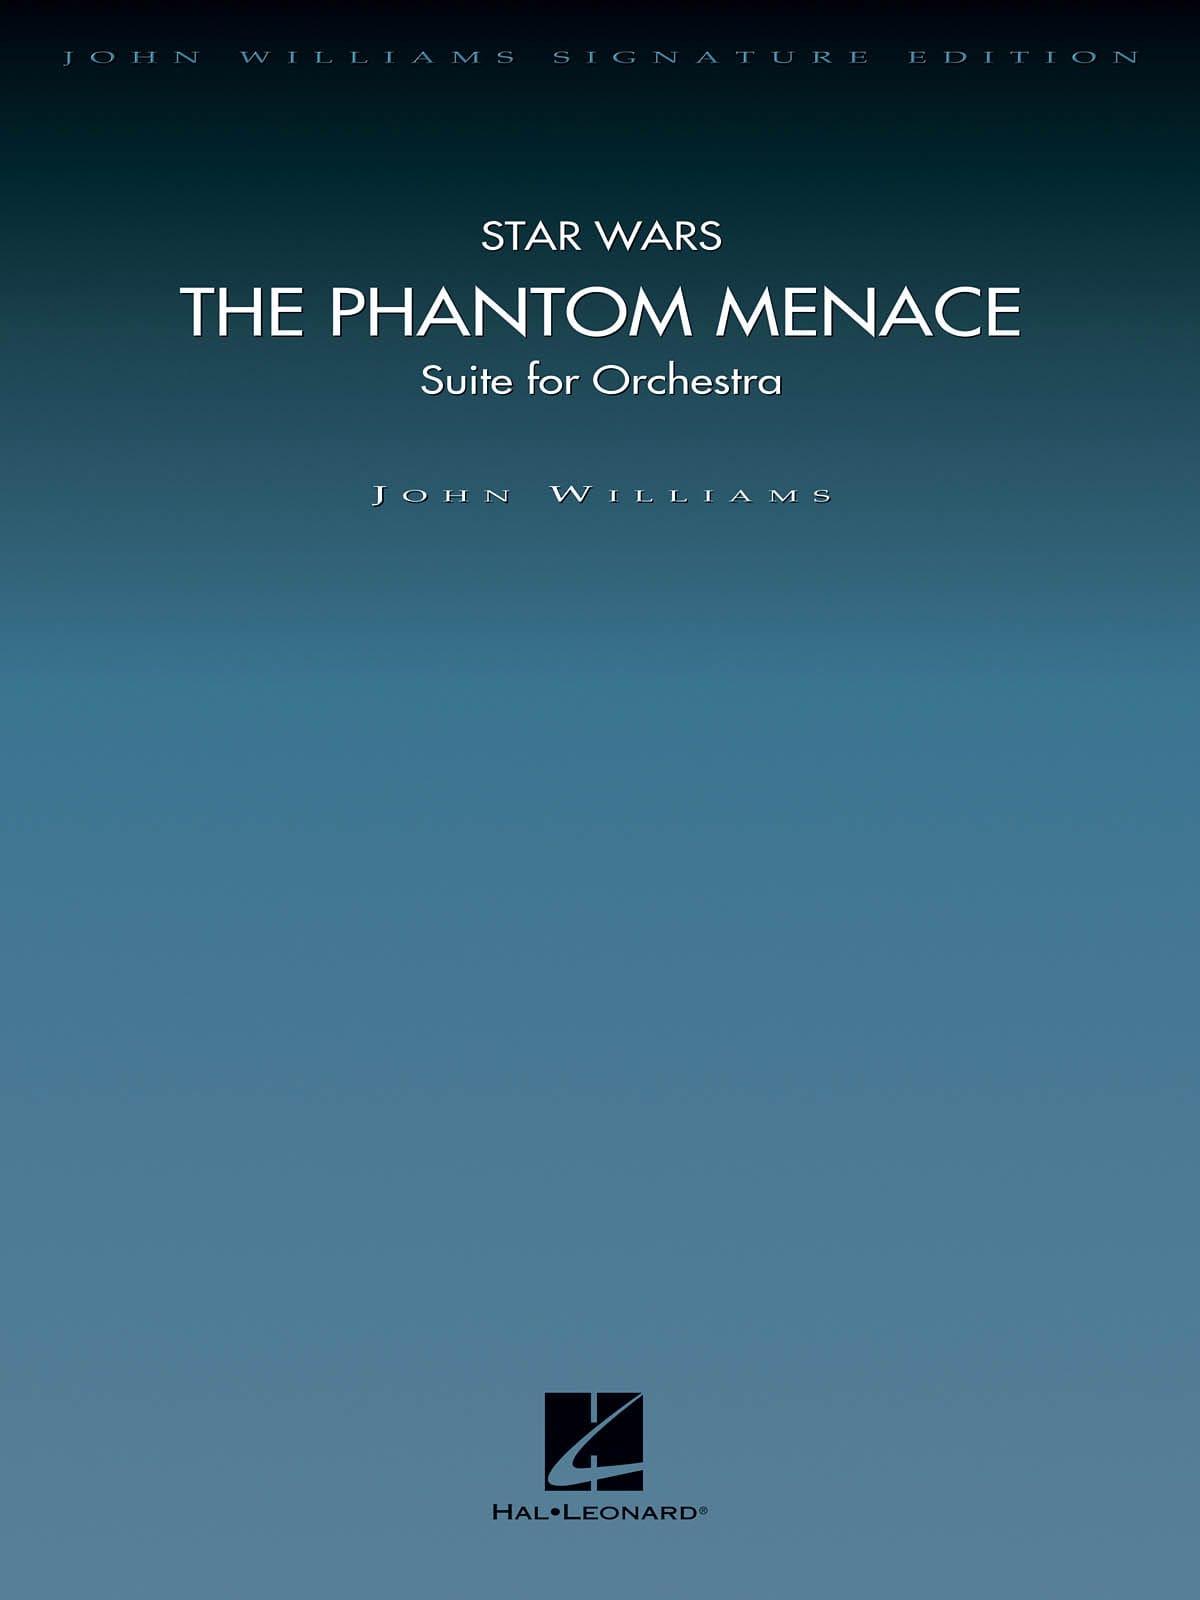 Star Wars The Phantom Menace - Episode 1 The Phantom Menace - laflutedepan.com